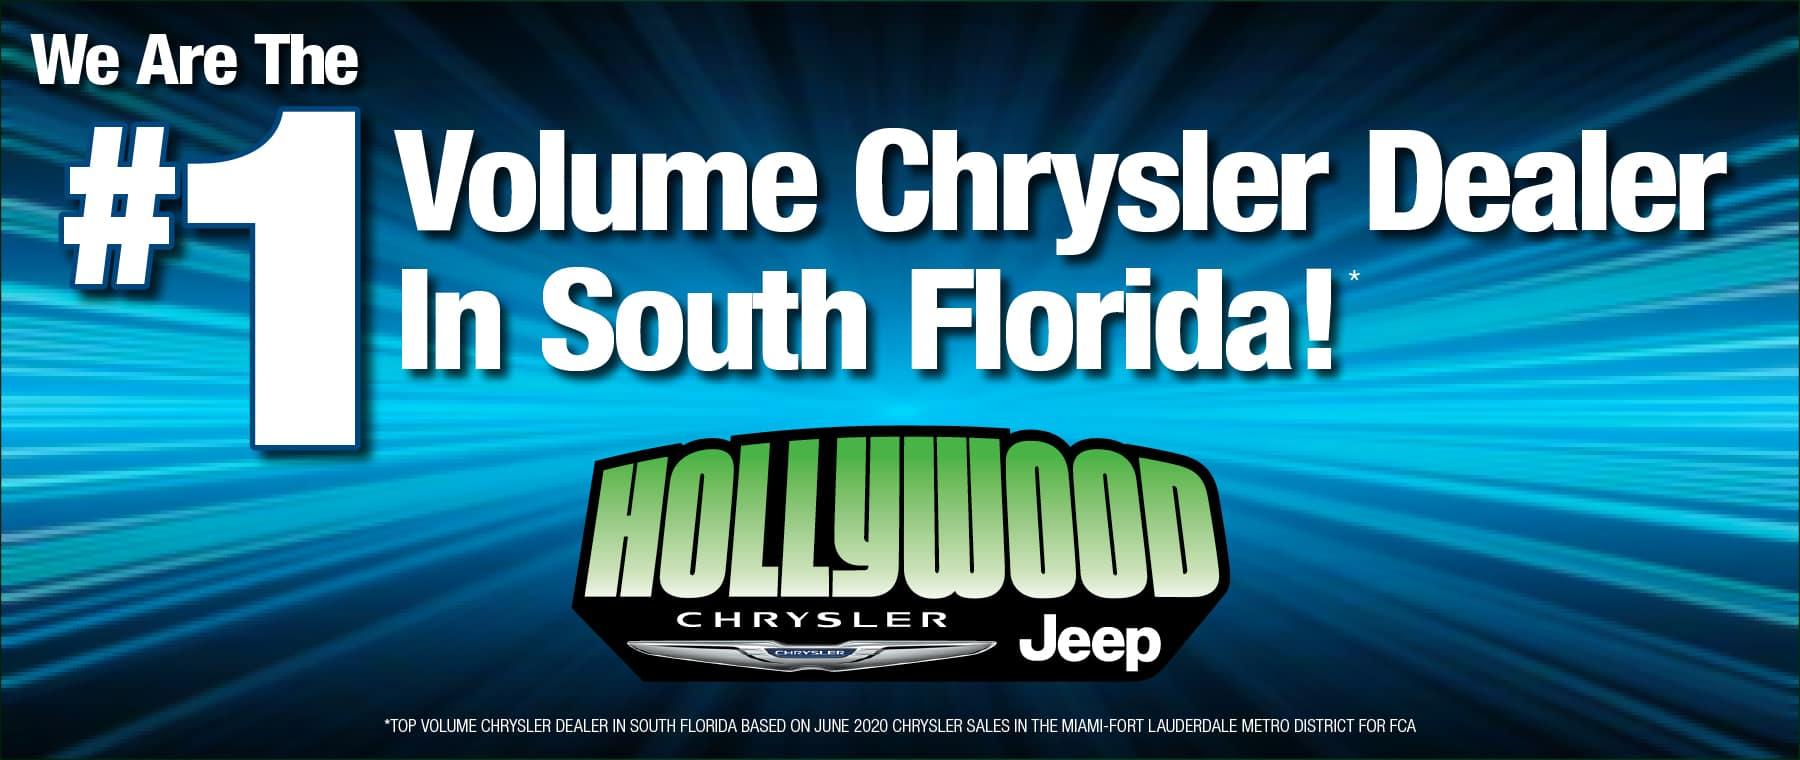 #1 Volume Chrysler Dealer in South Florida.